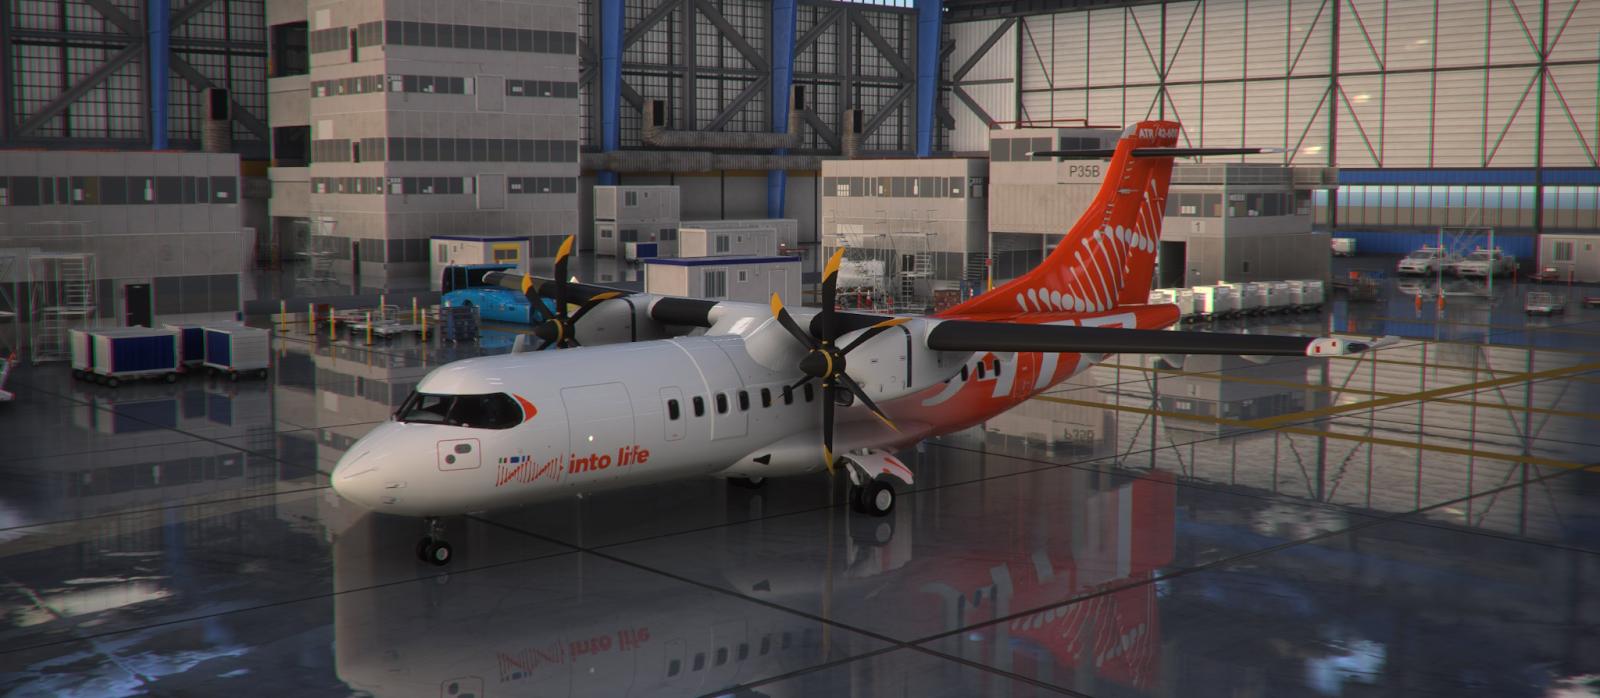 Milviz Previews ATR 72-600 for Microsoft Flight Simulator 607f4525dceb2252cc1f238e_QPRcAeIHWPj0370mFfnWzjP0IbjExEET4ic05hG0c7iK6n04vGUe2XOnsCOBdeEoQAK0ytdmsxnEH5T60AycB_MN8D8n_Md_Y7iq-__PNrfG2SxtSYOVOX_o_NmhZcbA6ffjgNP7